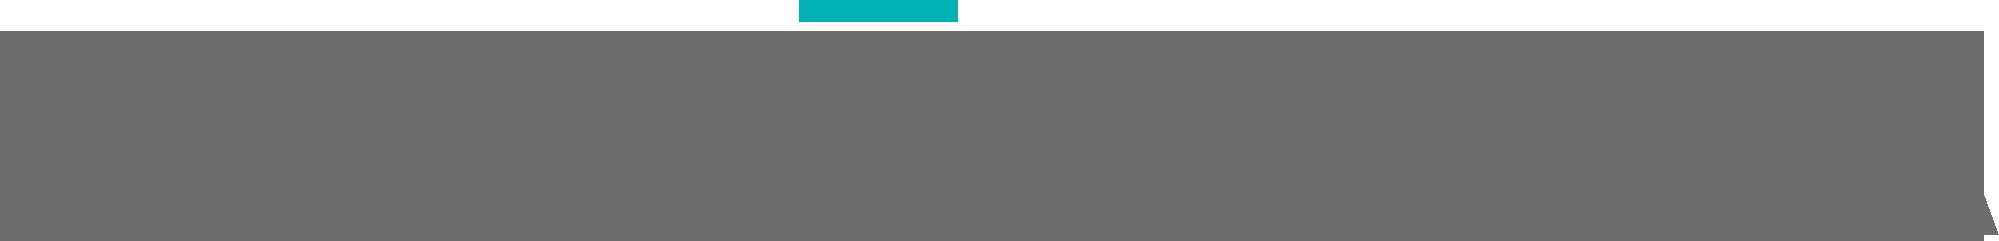 Glace Media logo